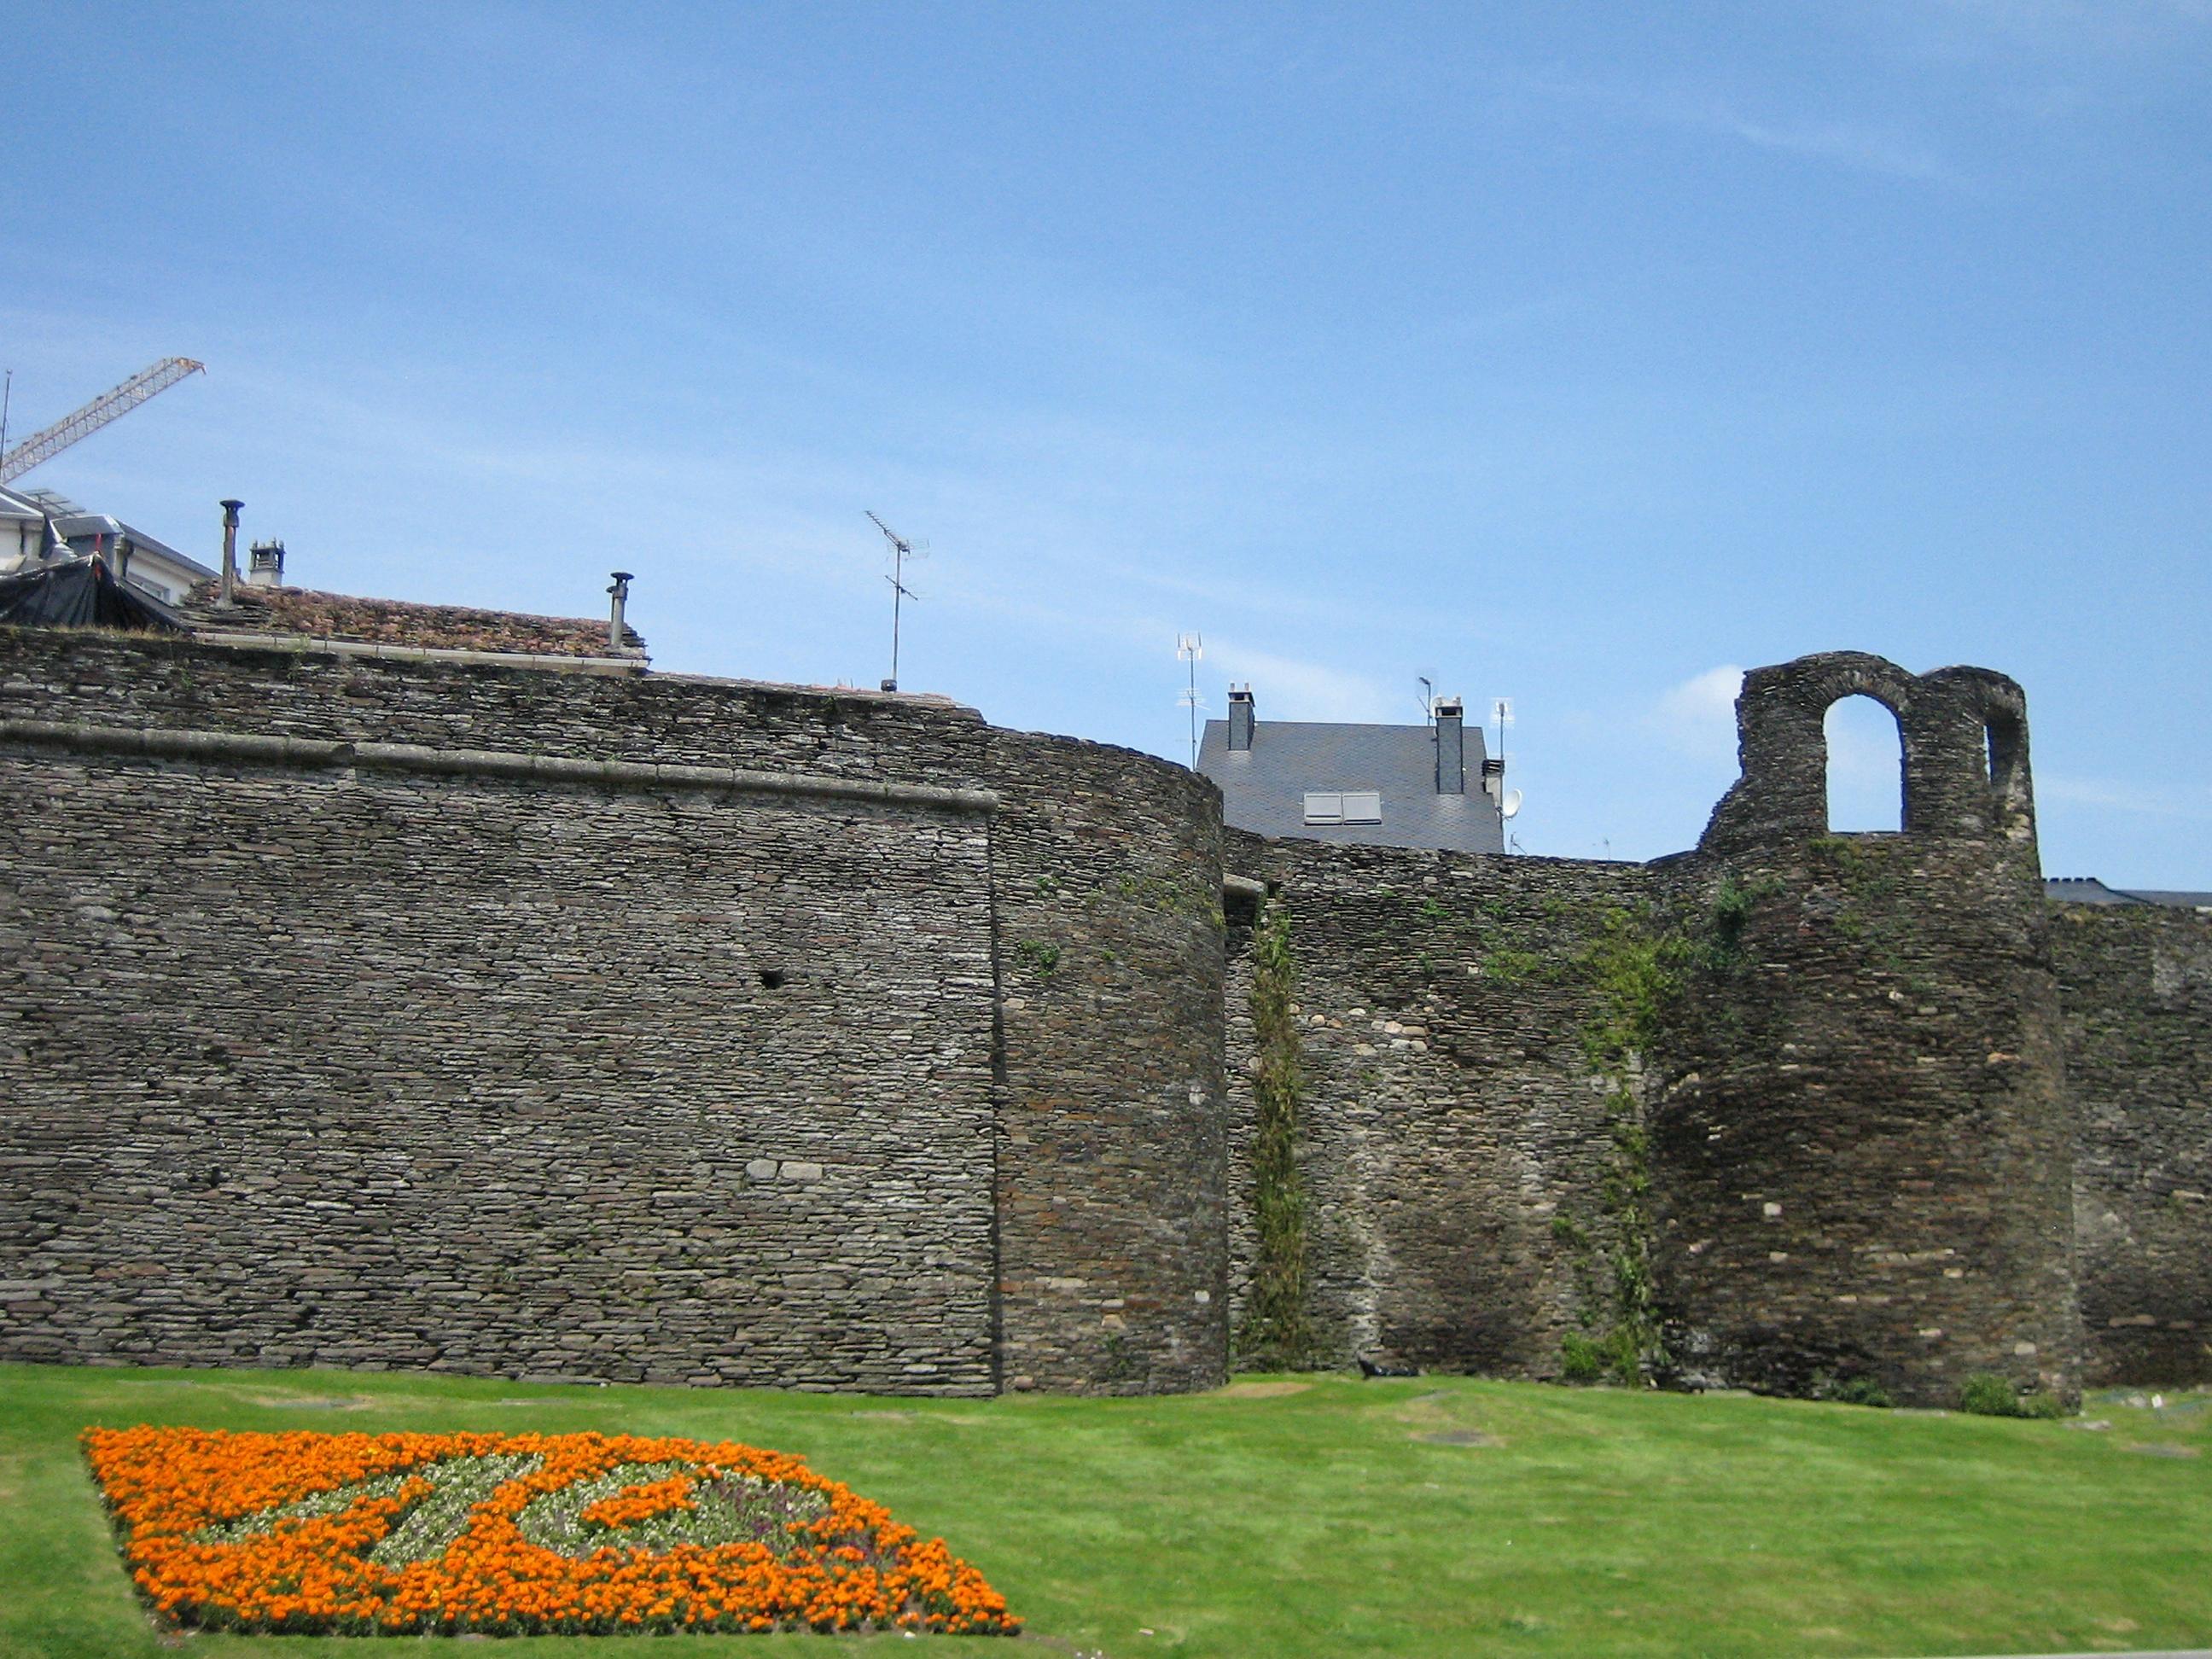 Roman Walls of Lugo - Sights